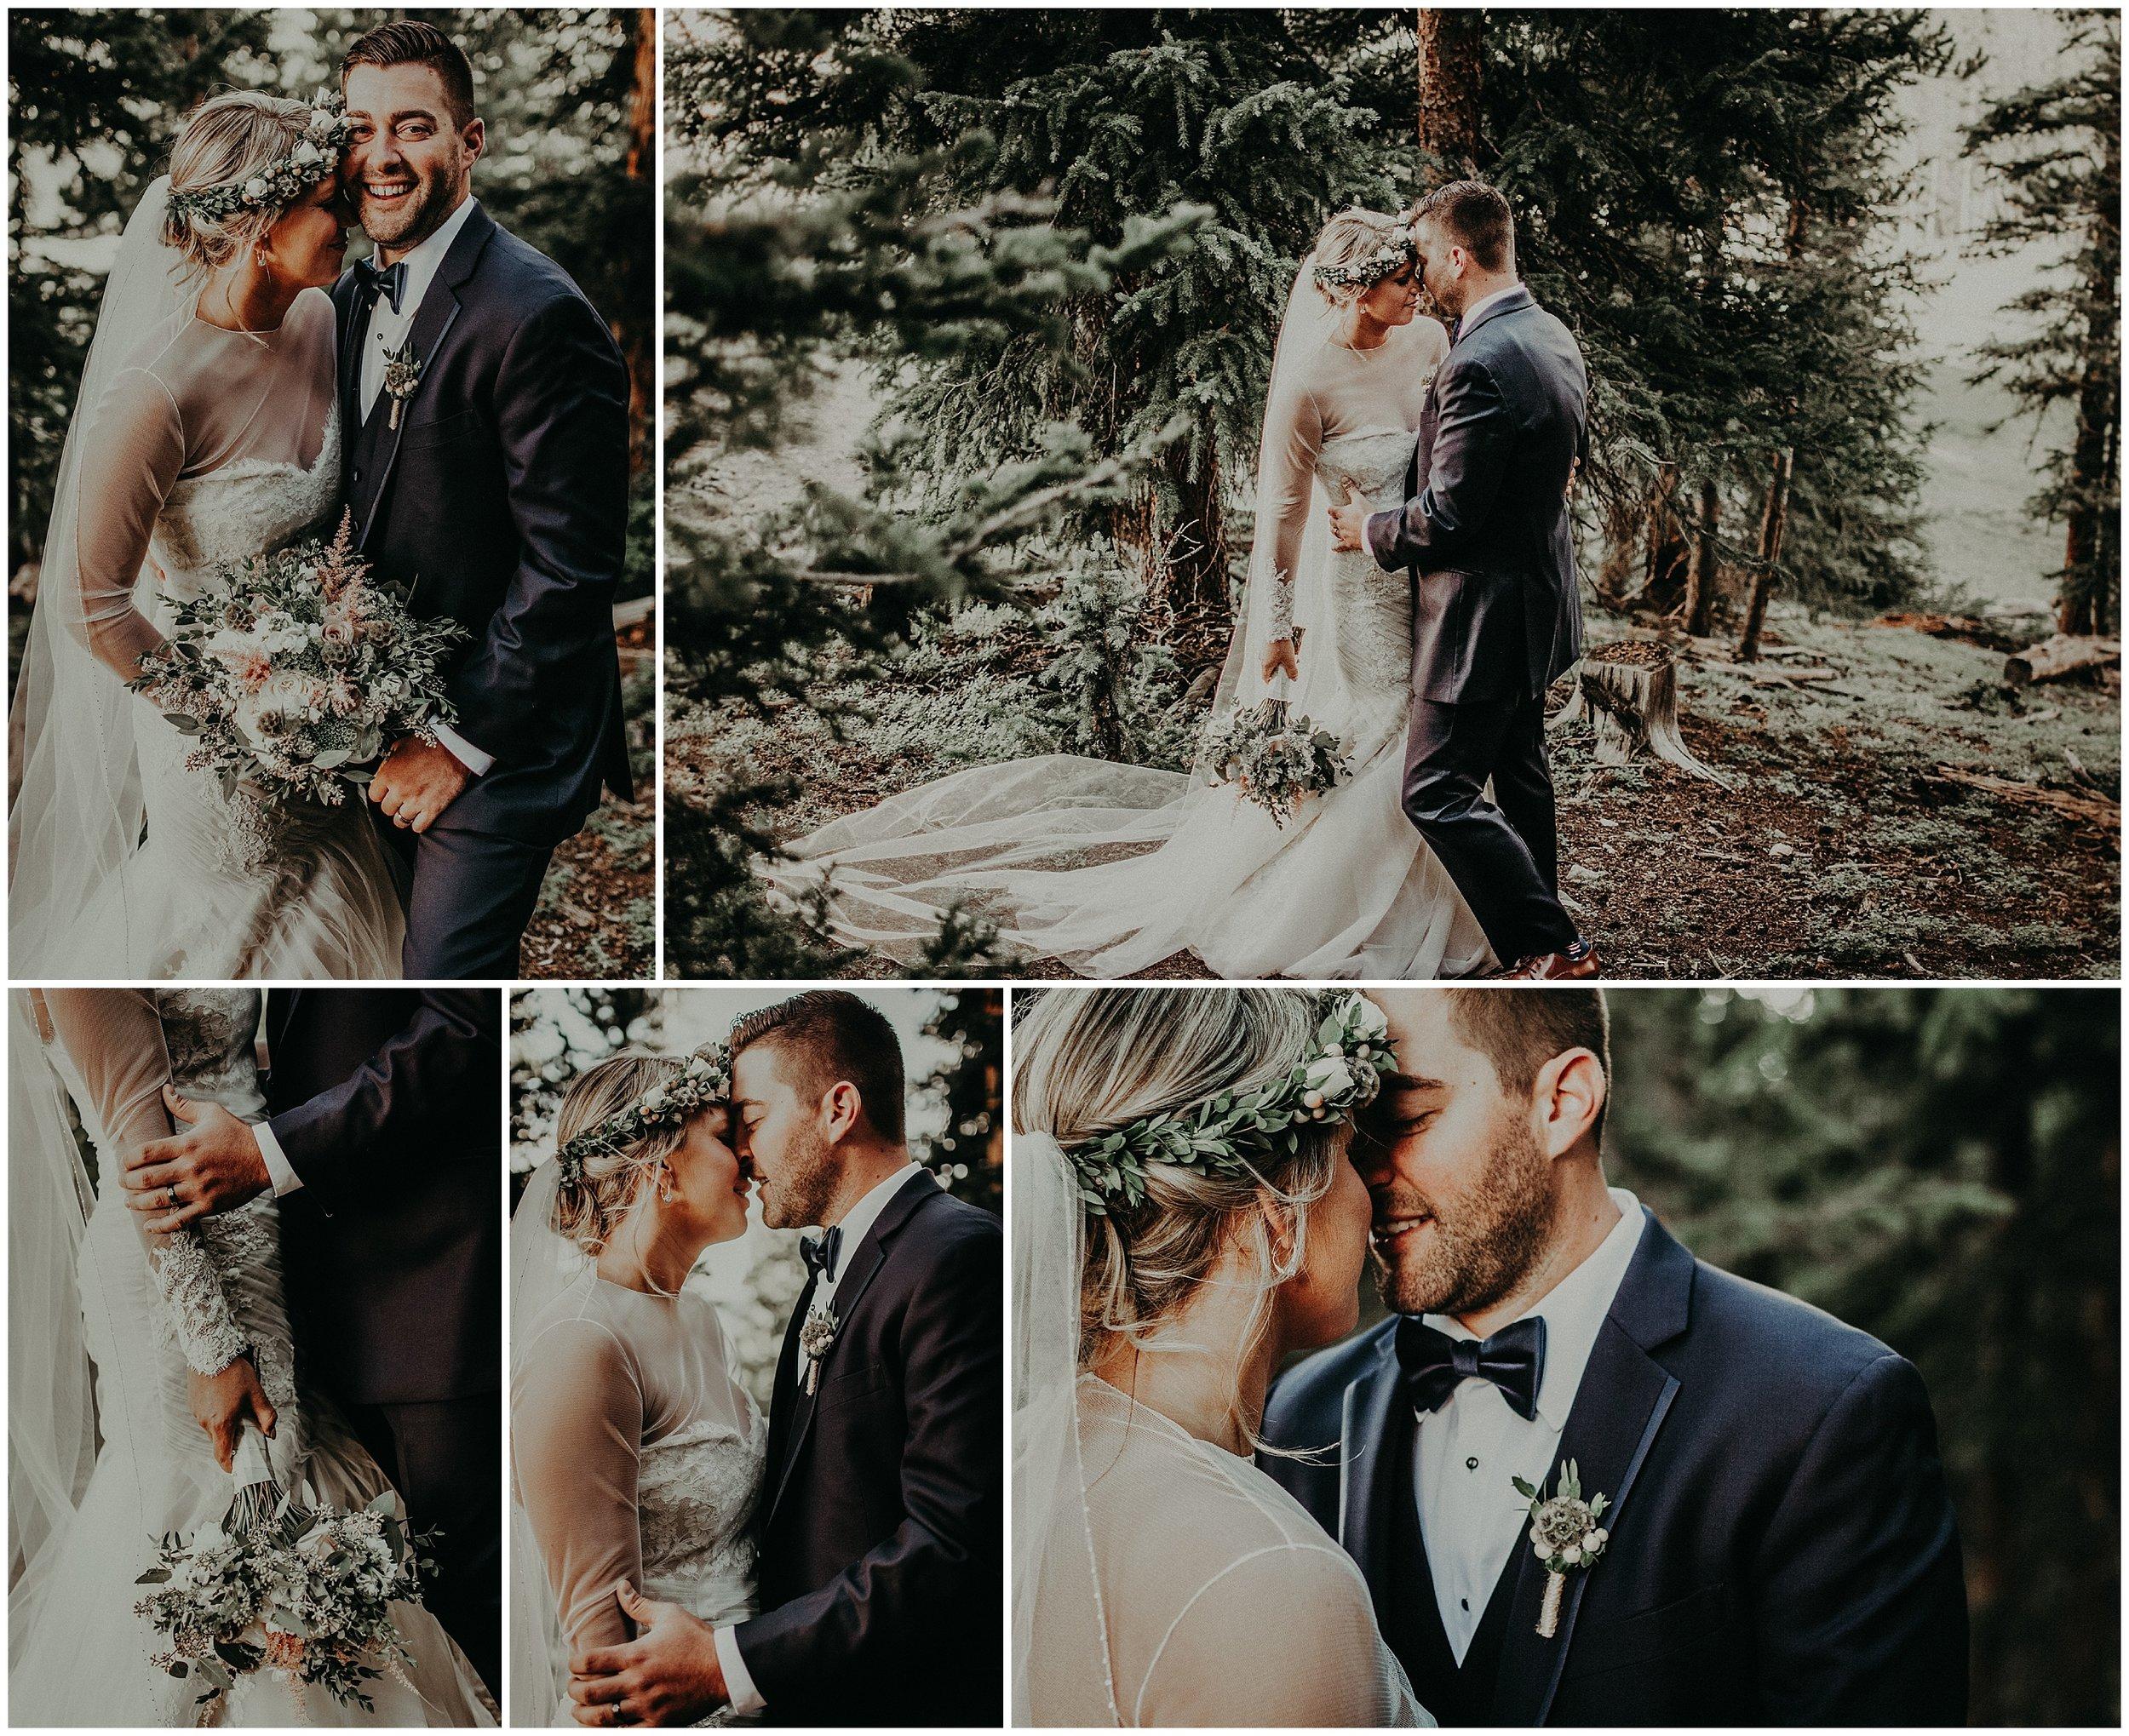 keystone_colorado_wedding_photographer12